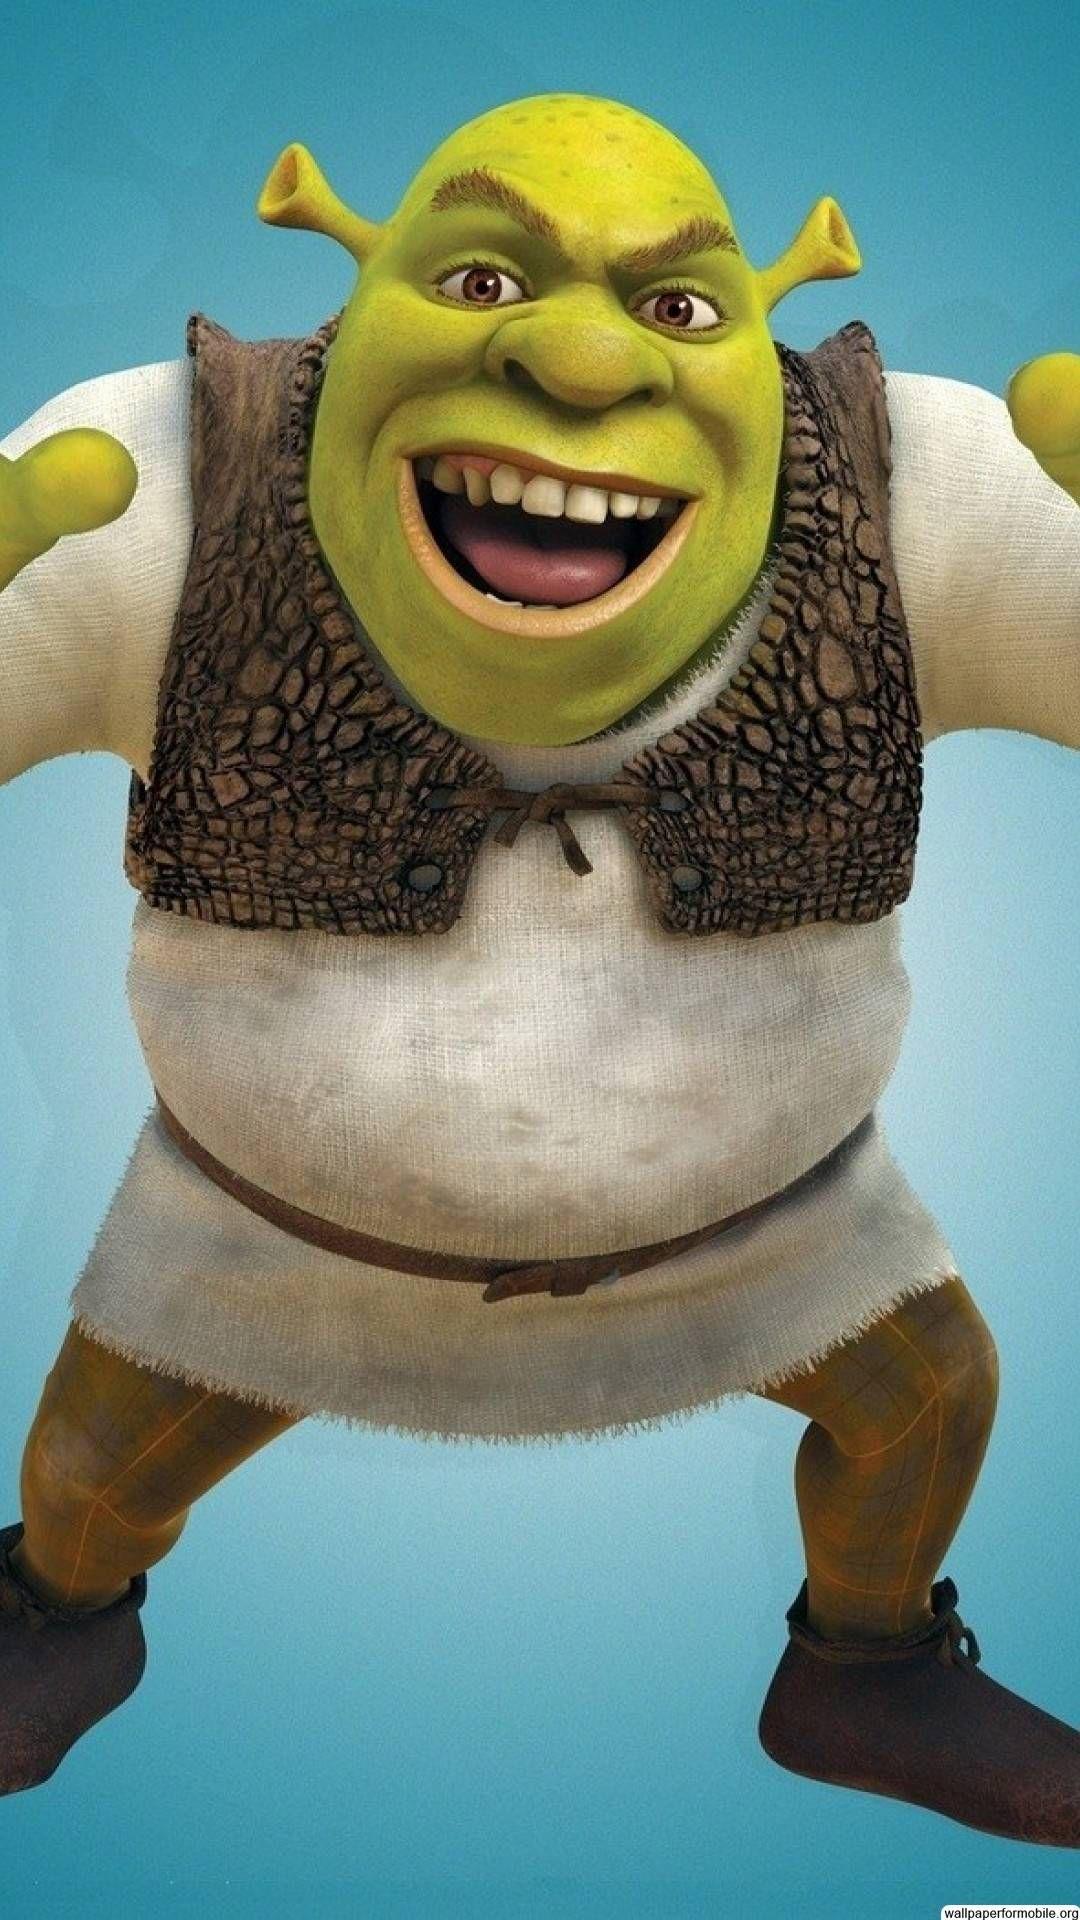 Free Shrek Wallpaper Mobile Wallpapers Personagens de